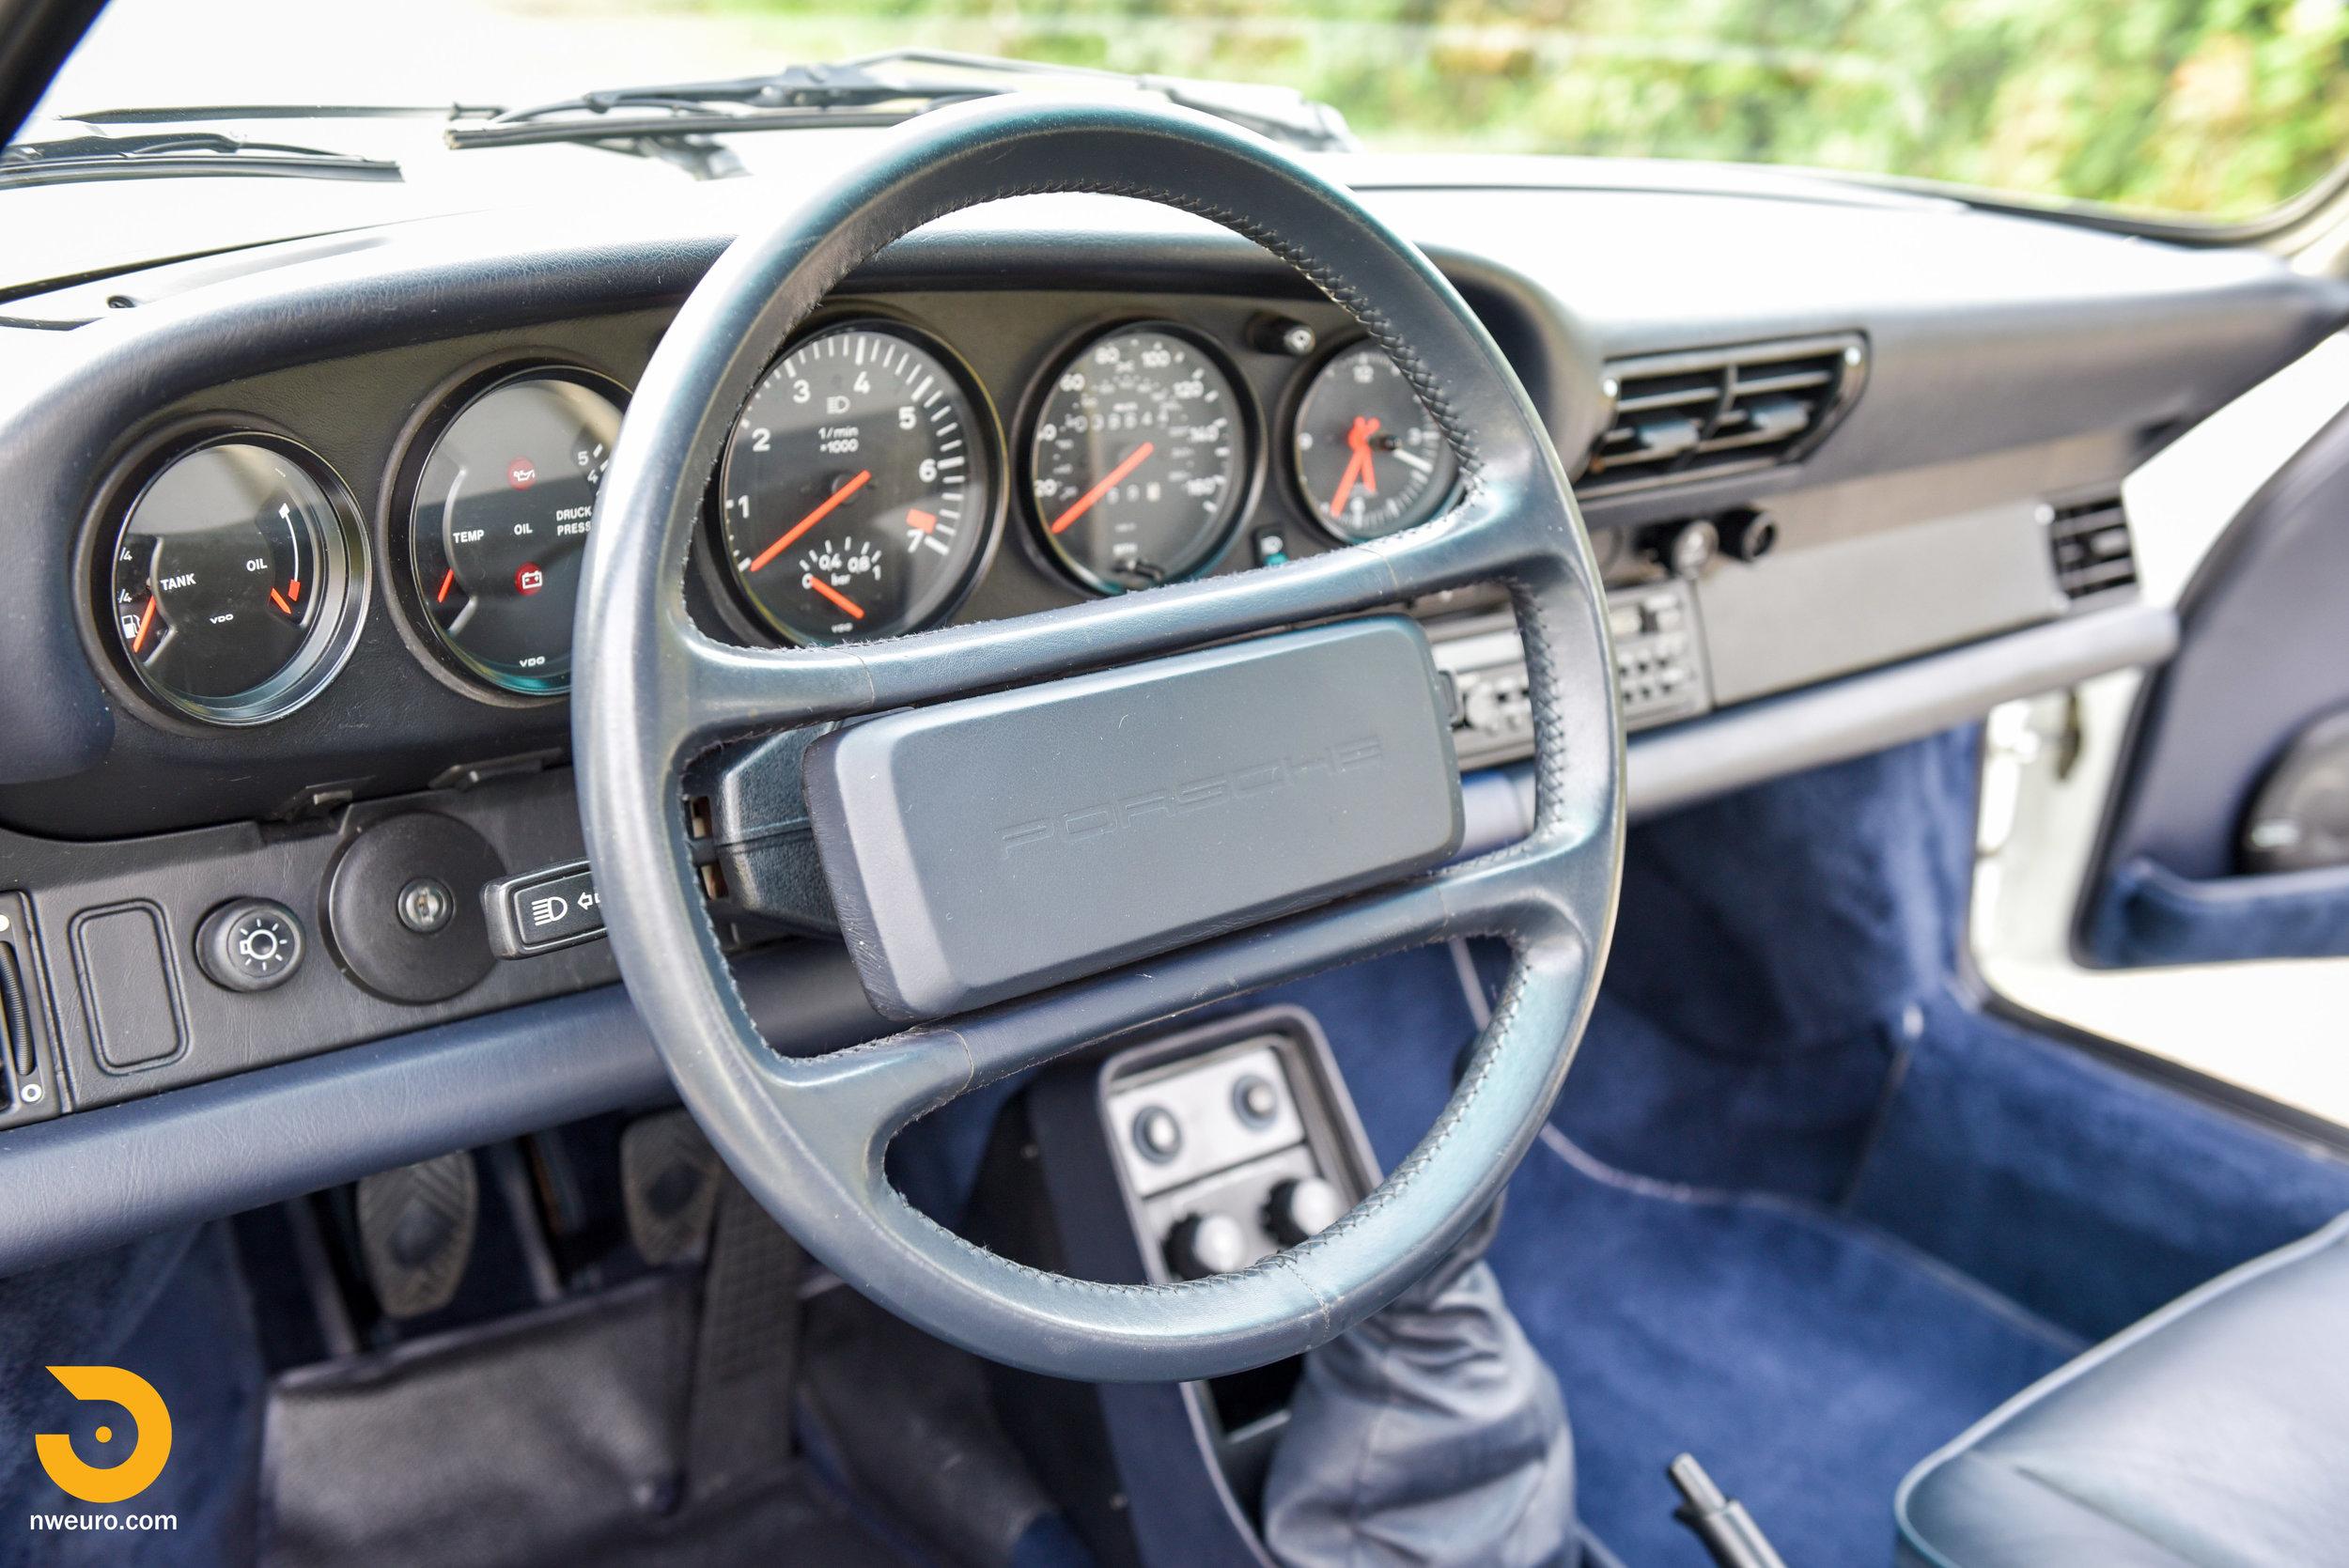 1987 Porsche 930 Slant Nose Cab-37.jpg